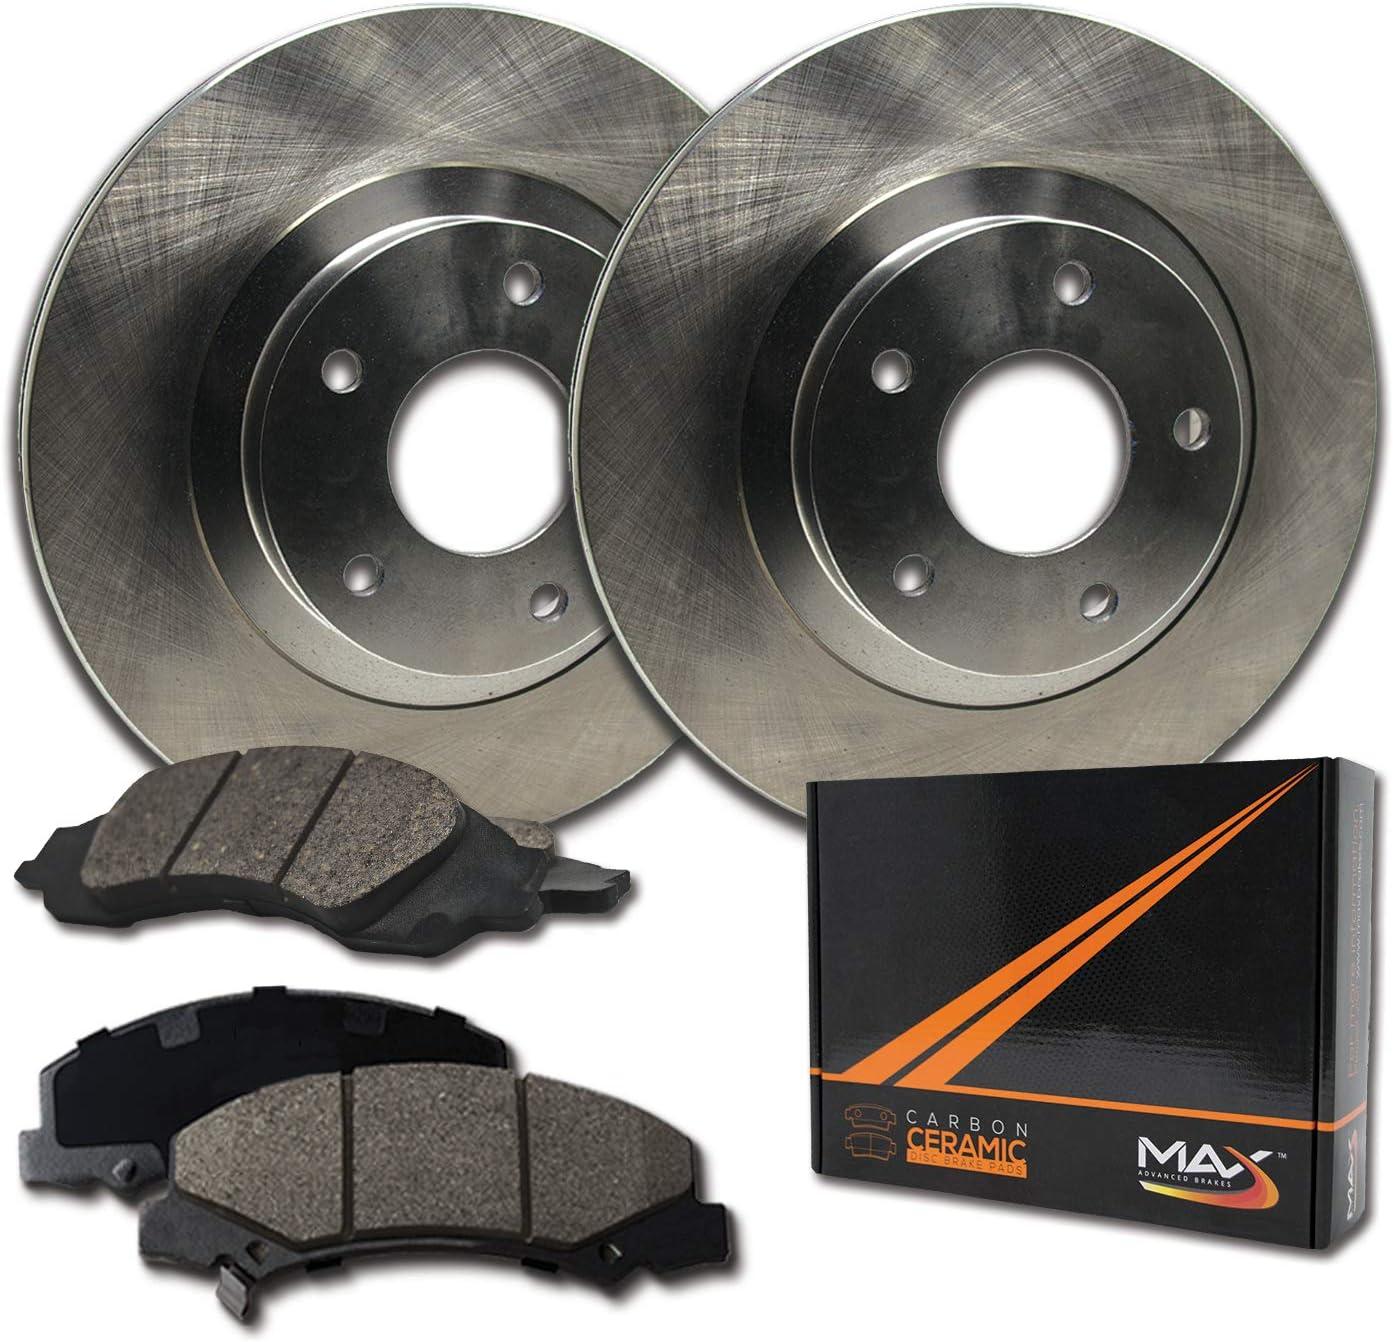 Rear Max Brakes Premium OE Popular Rotors Pads Ceramic KT1 Carbon with Latest item